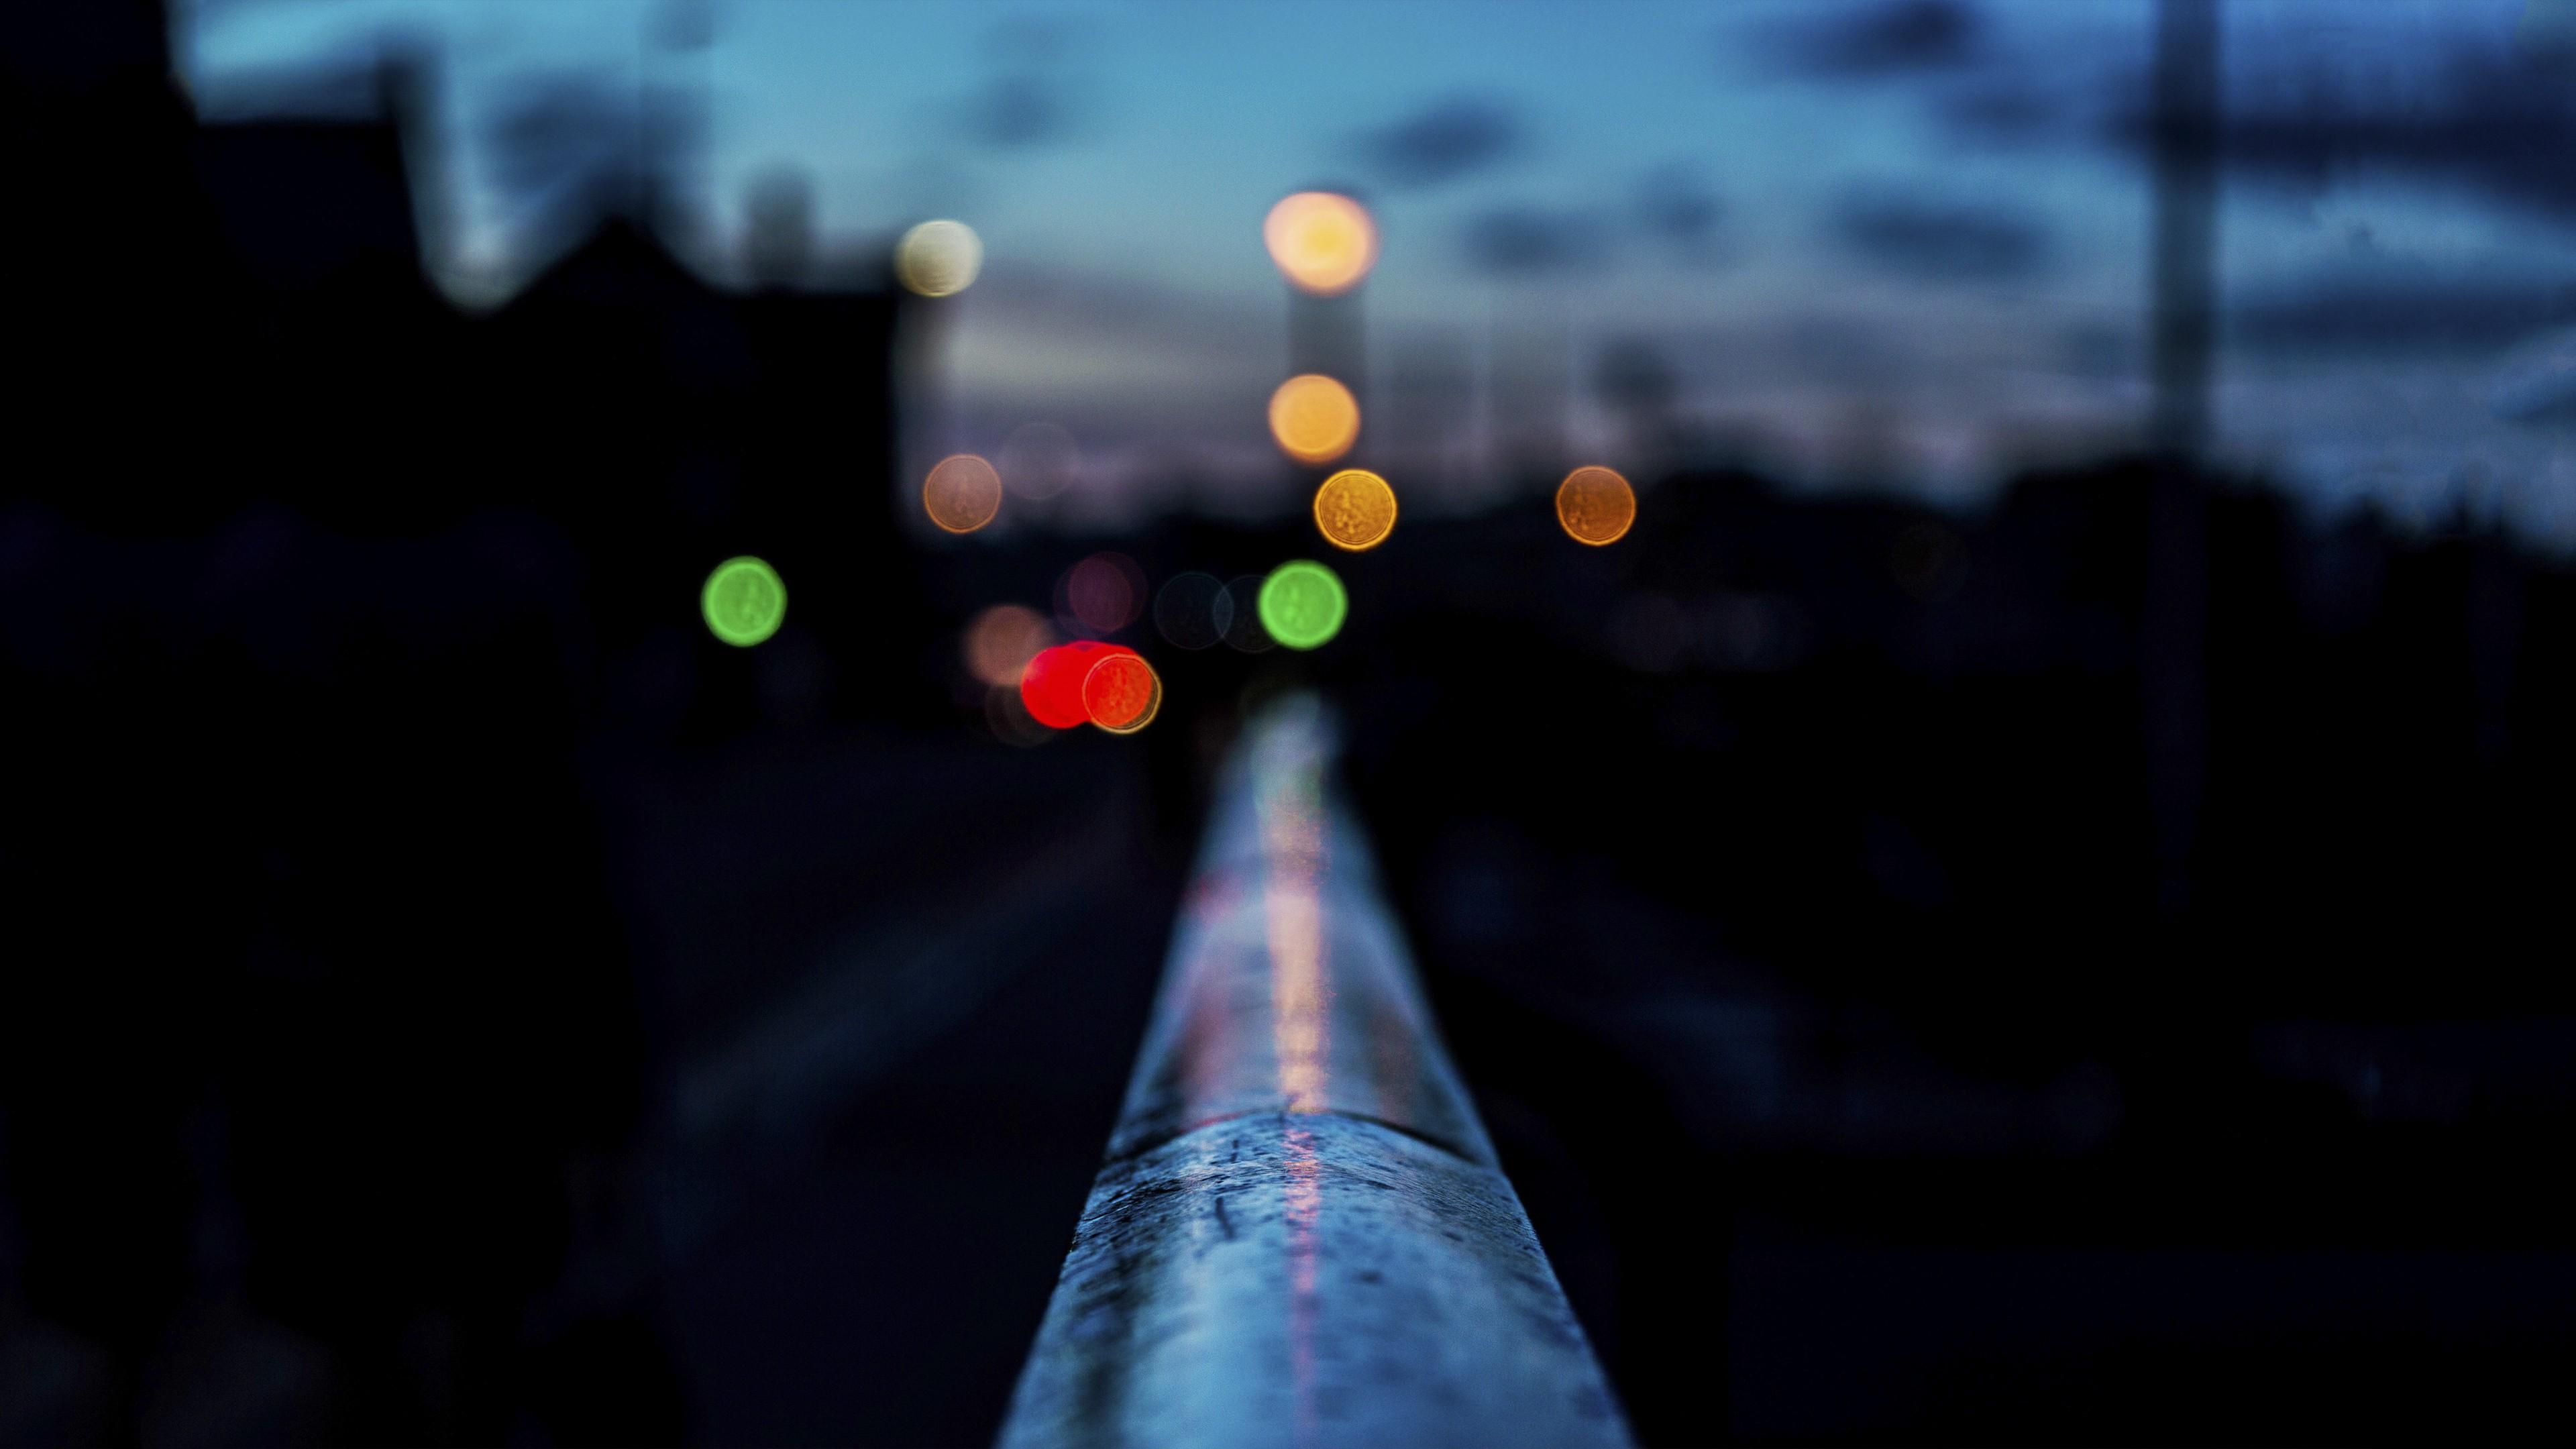 Download Wallpaper Night Abstract - railing-3840x2160-4k-5k-hd-wallpaper-night-bokeh-6152  Collection.jpg